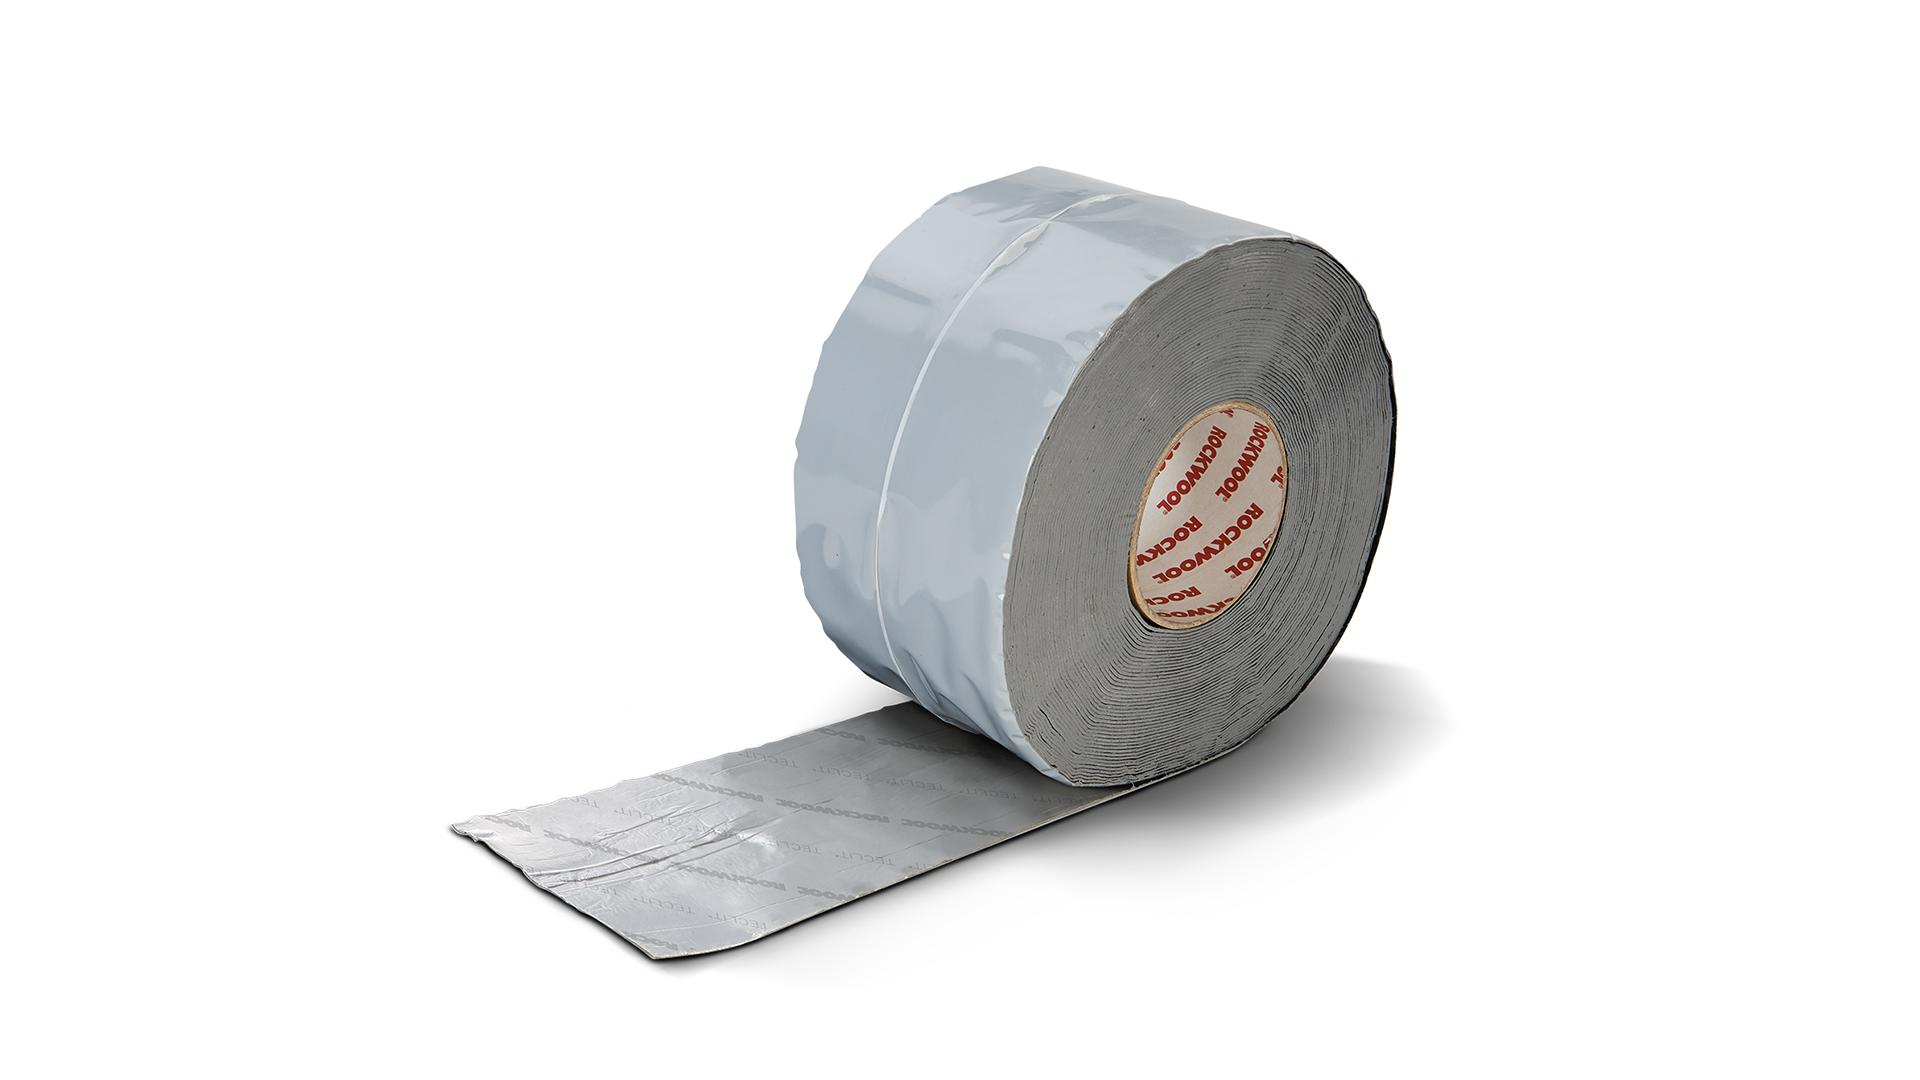 TECLIT Flextape, productfoto, HVAC, koude-isolatie